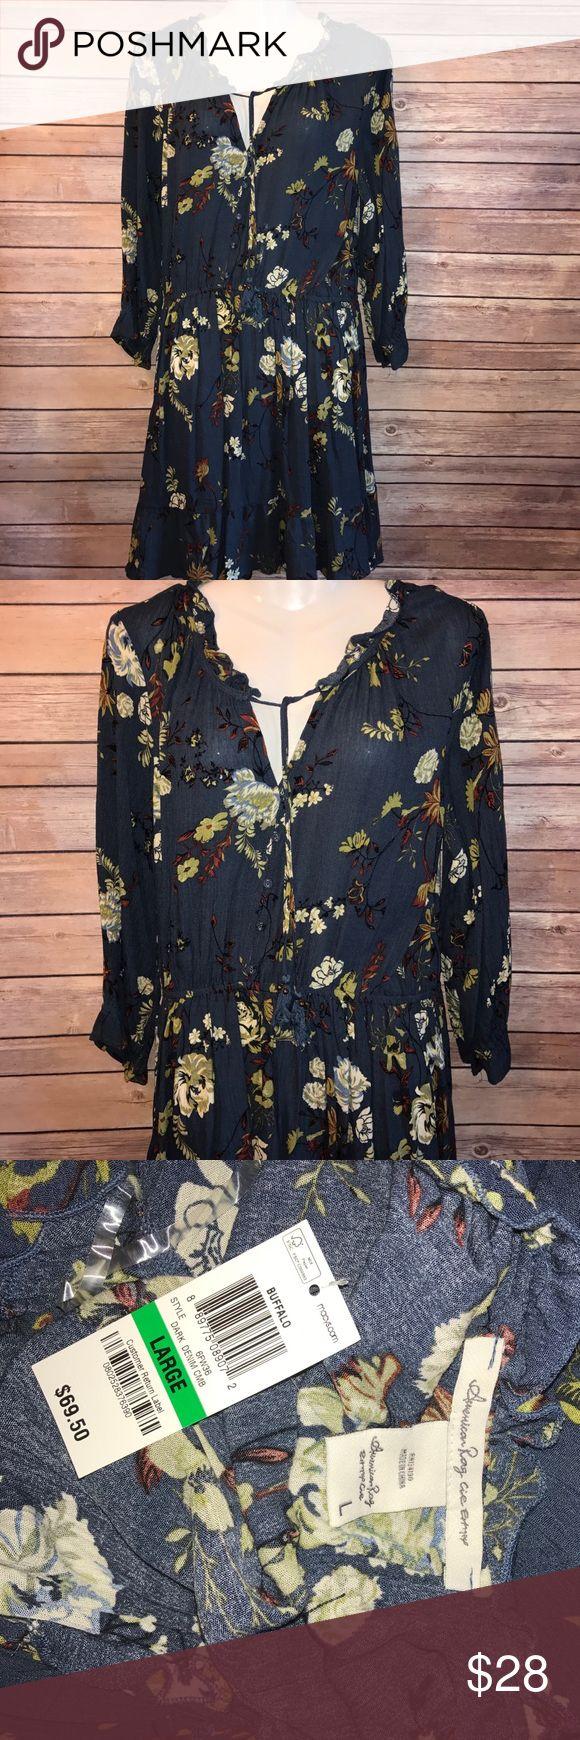 Long sleeve dress Brand new!! Long sleeve dress size:L brand: American Rag American Rag Dresses Long Sleeve